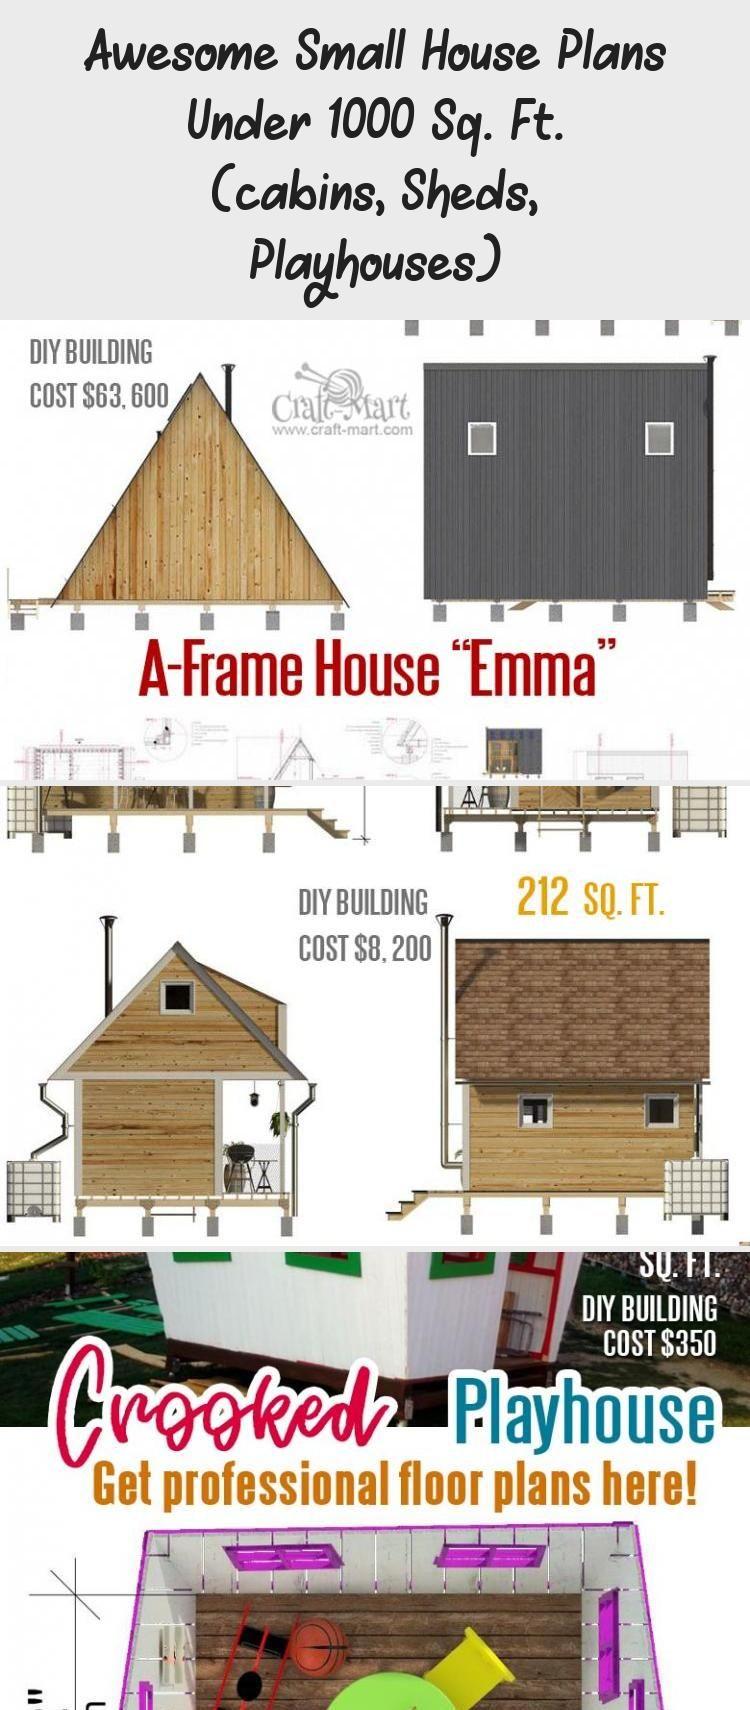 En Blog En Blog In 2020 Small House Plans Small House House Plans